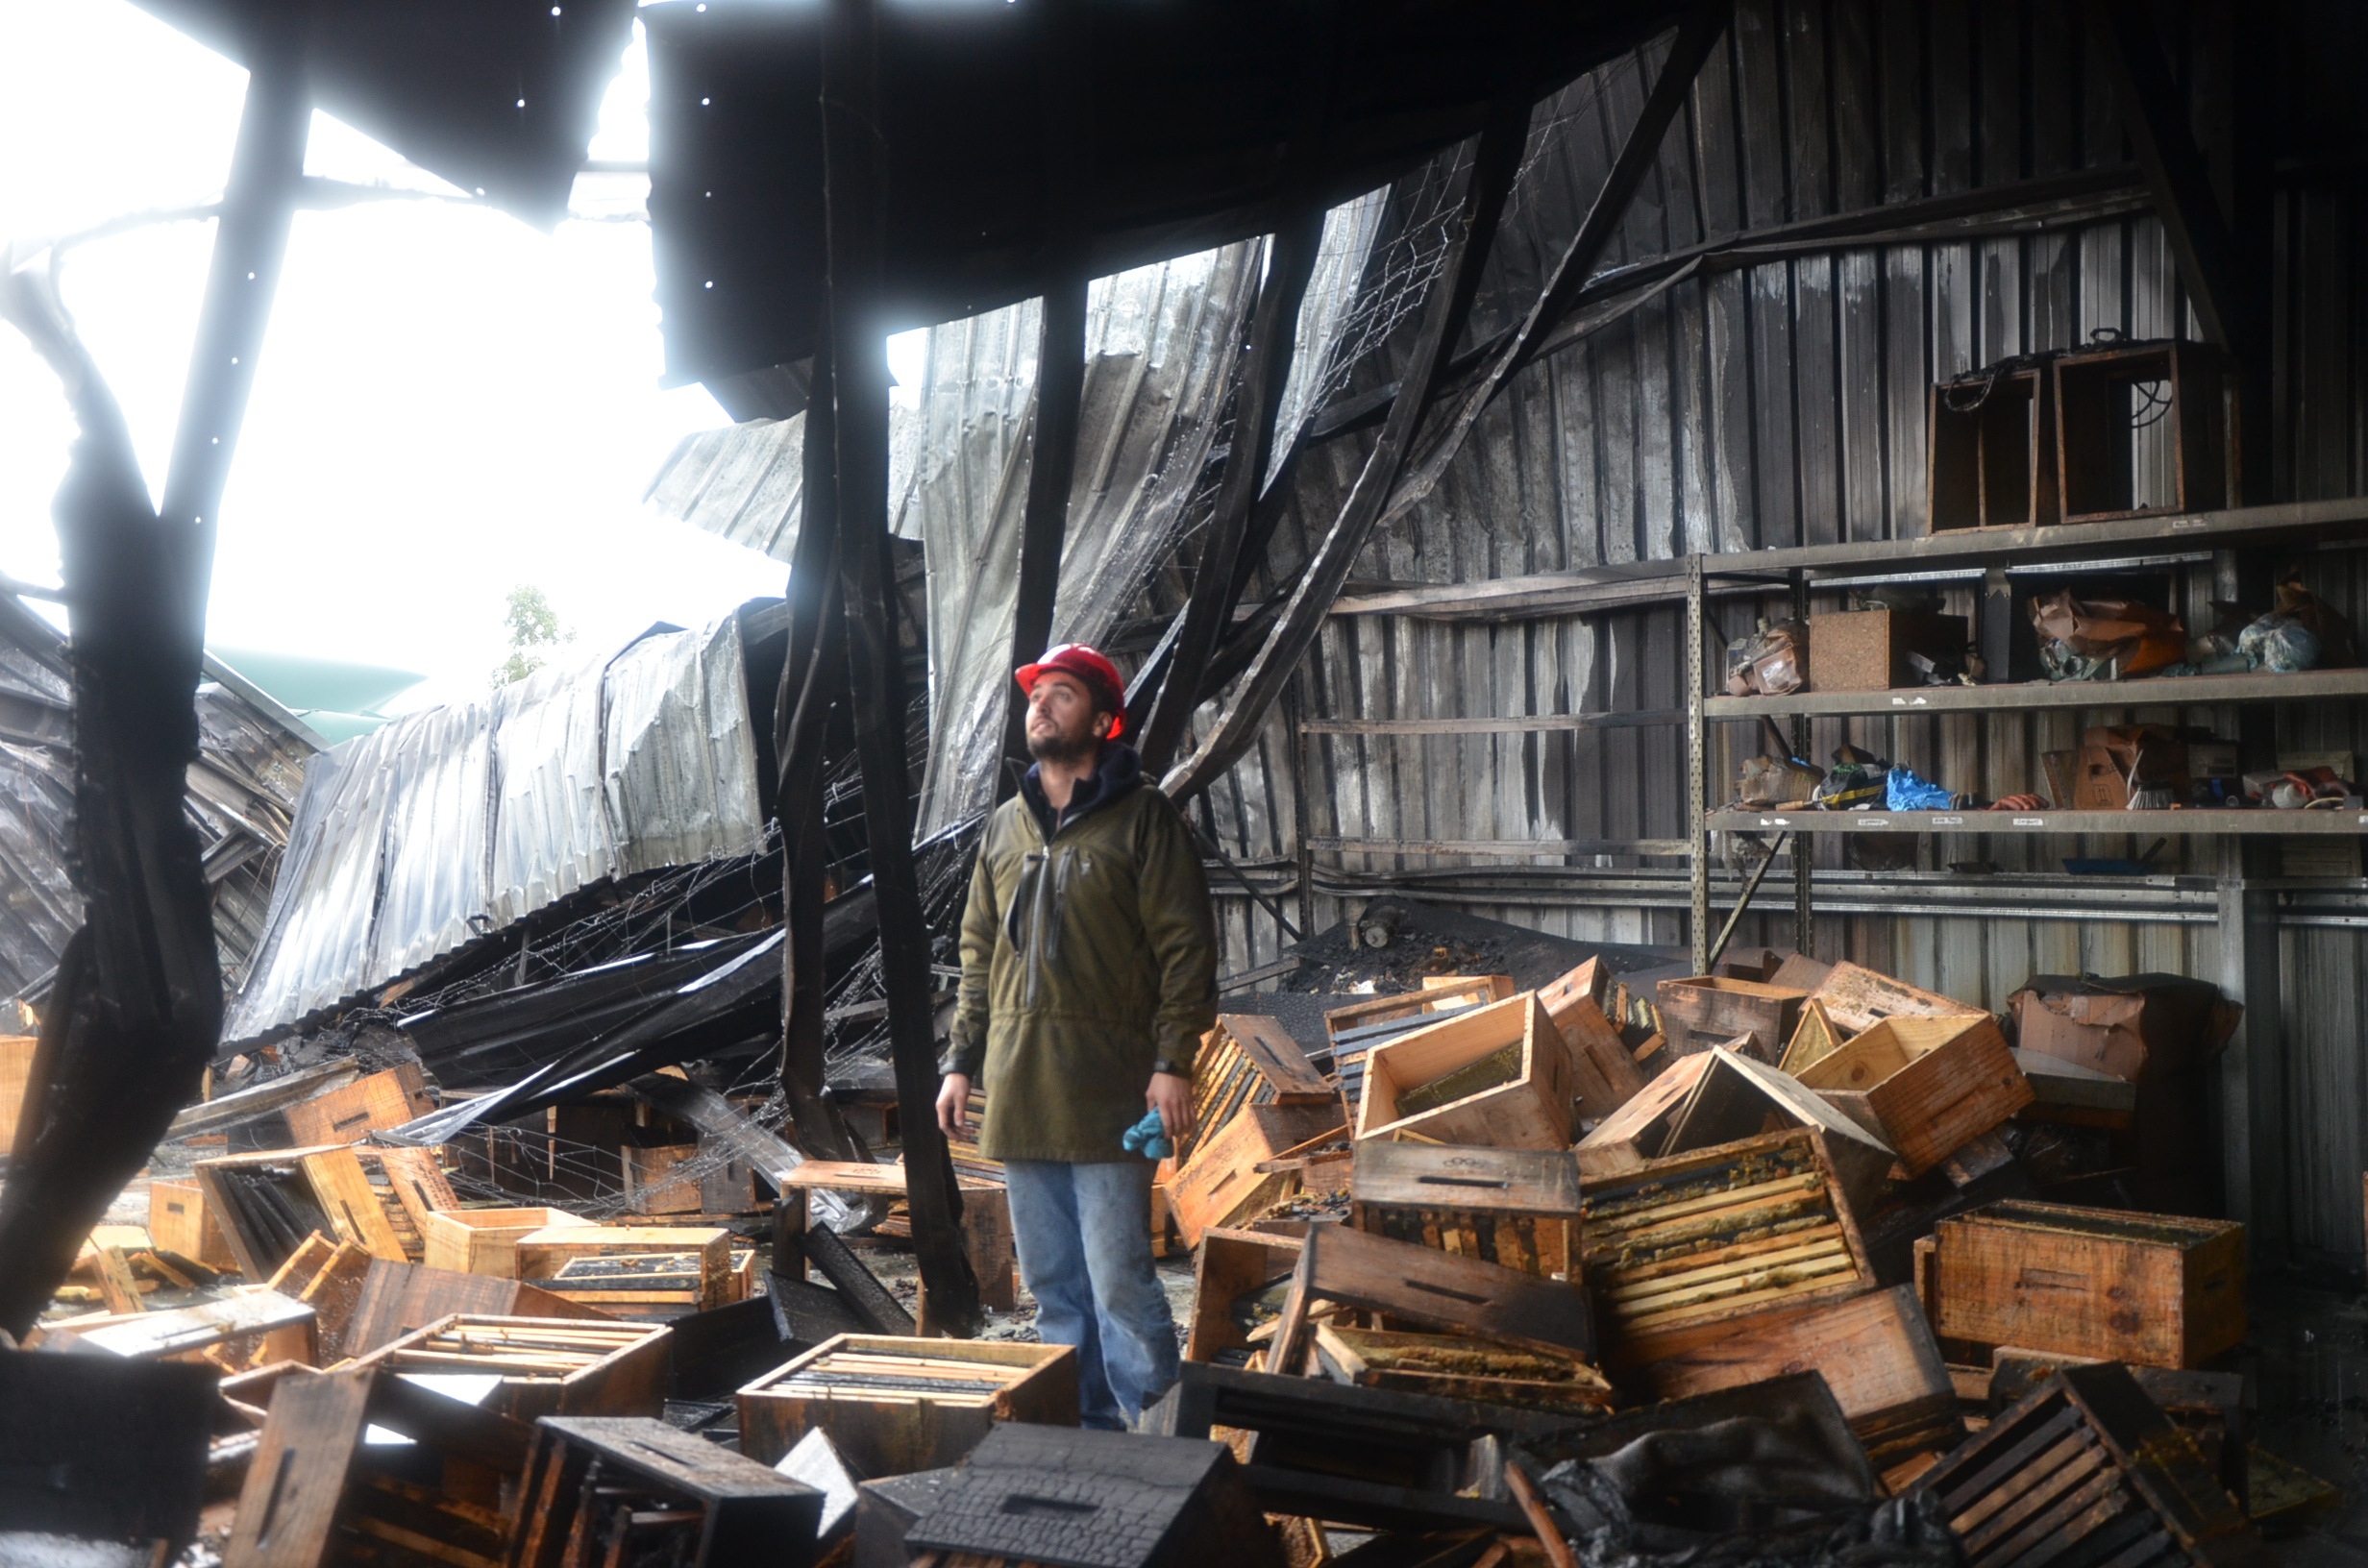 https://campaign-image.com/zohocampaigns/338309000007598004_zc_v20_james_in_burnt_shed.jpg